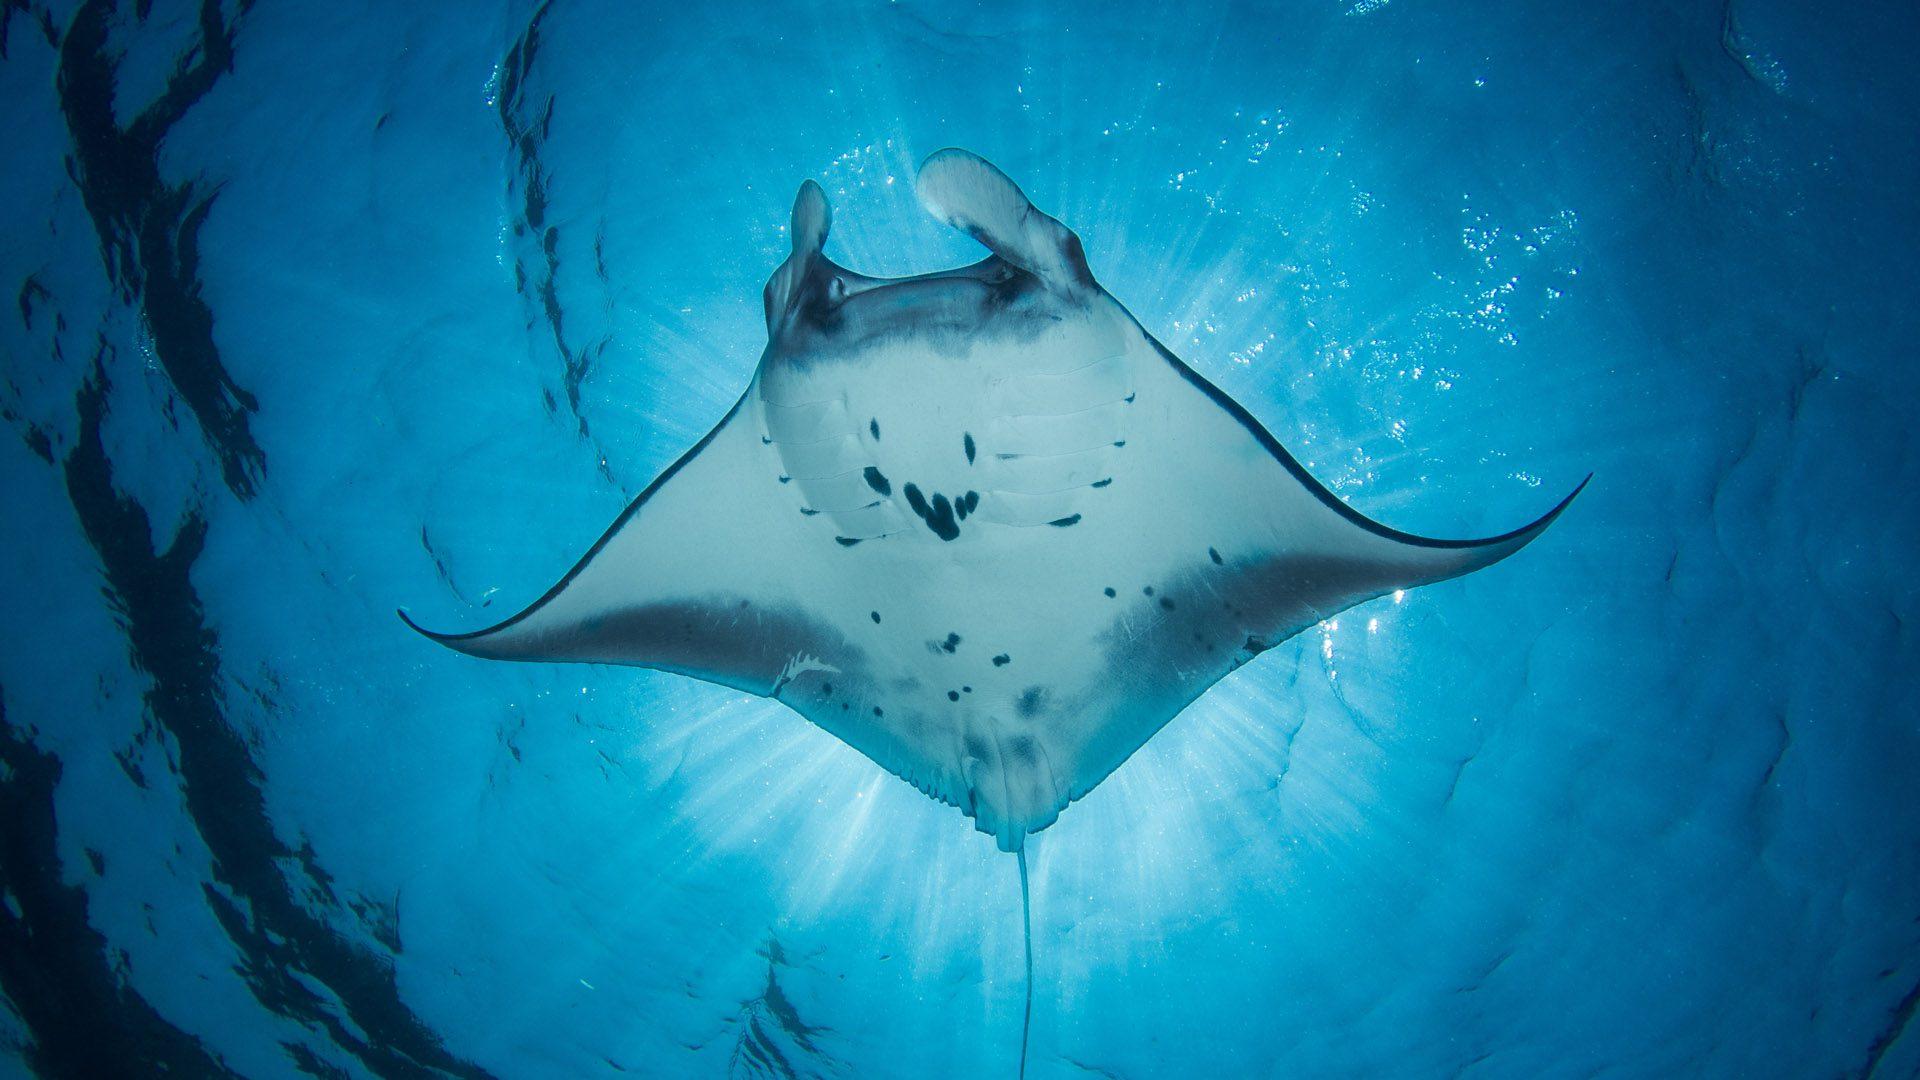 A manta ray in the ocean